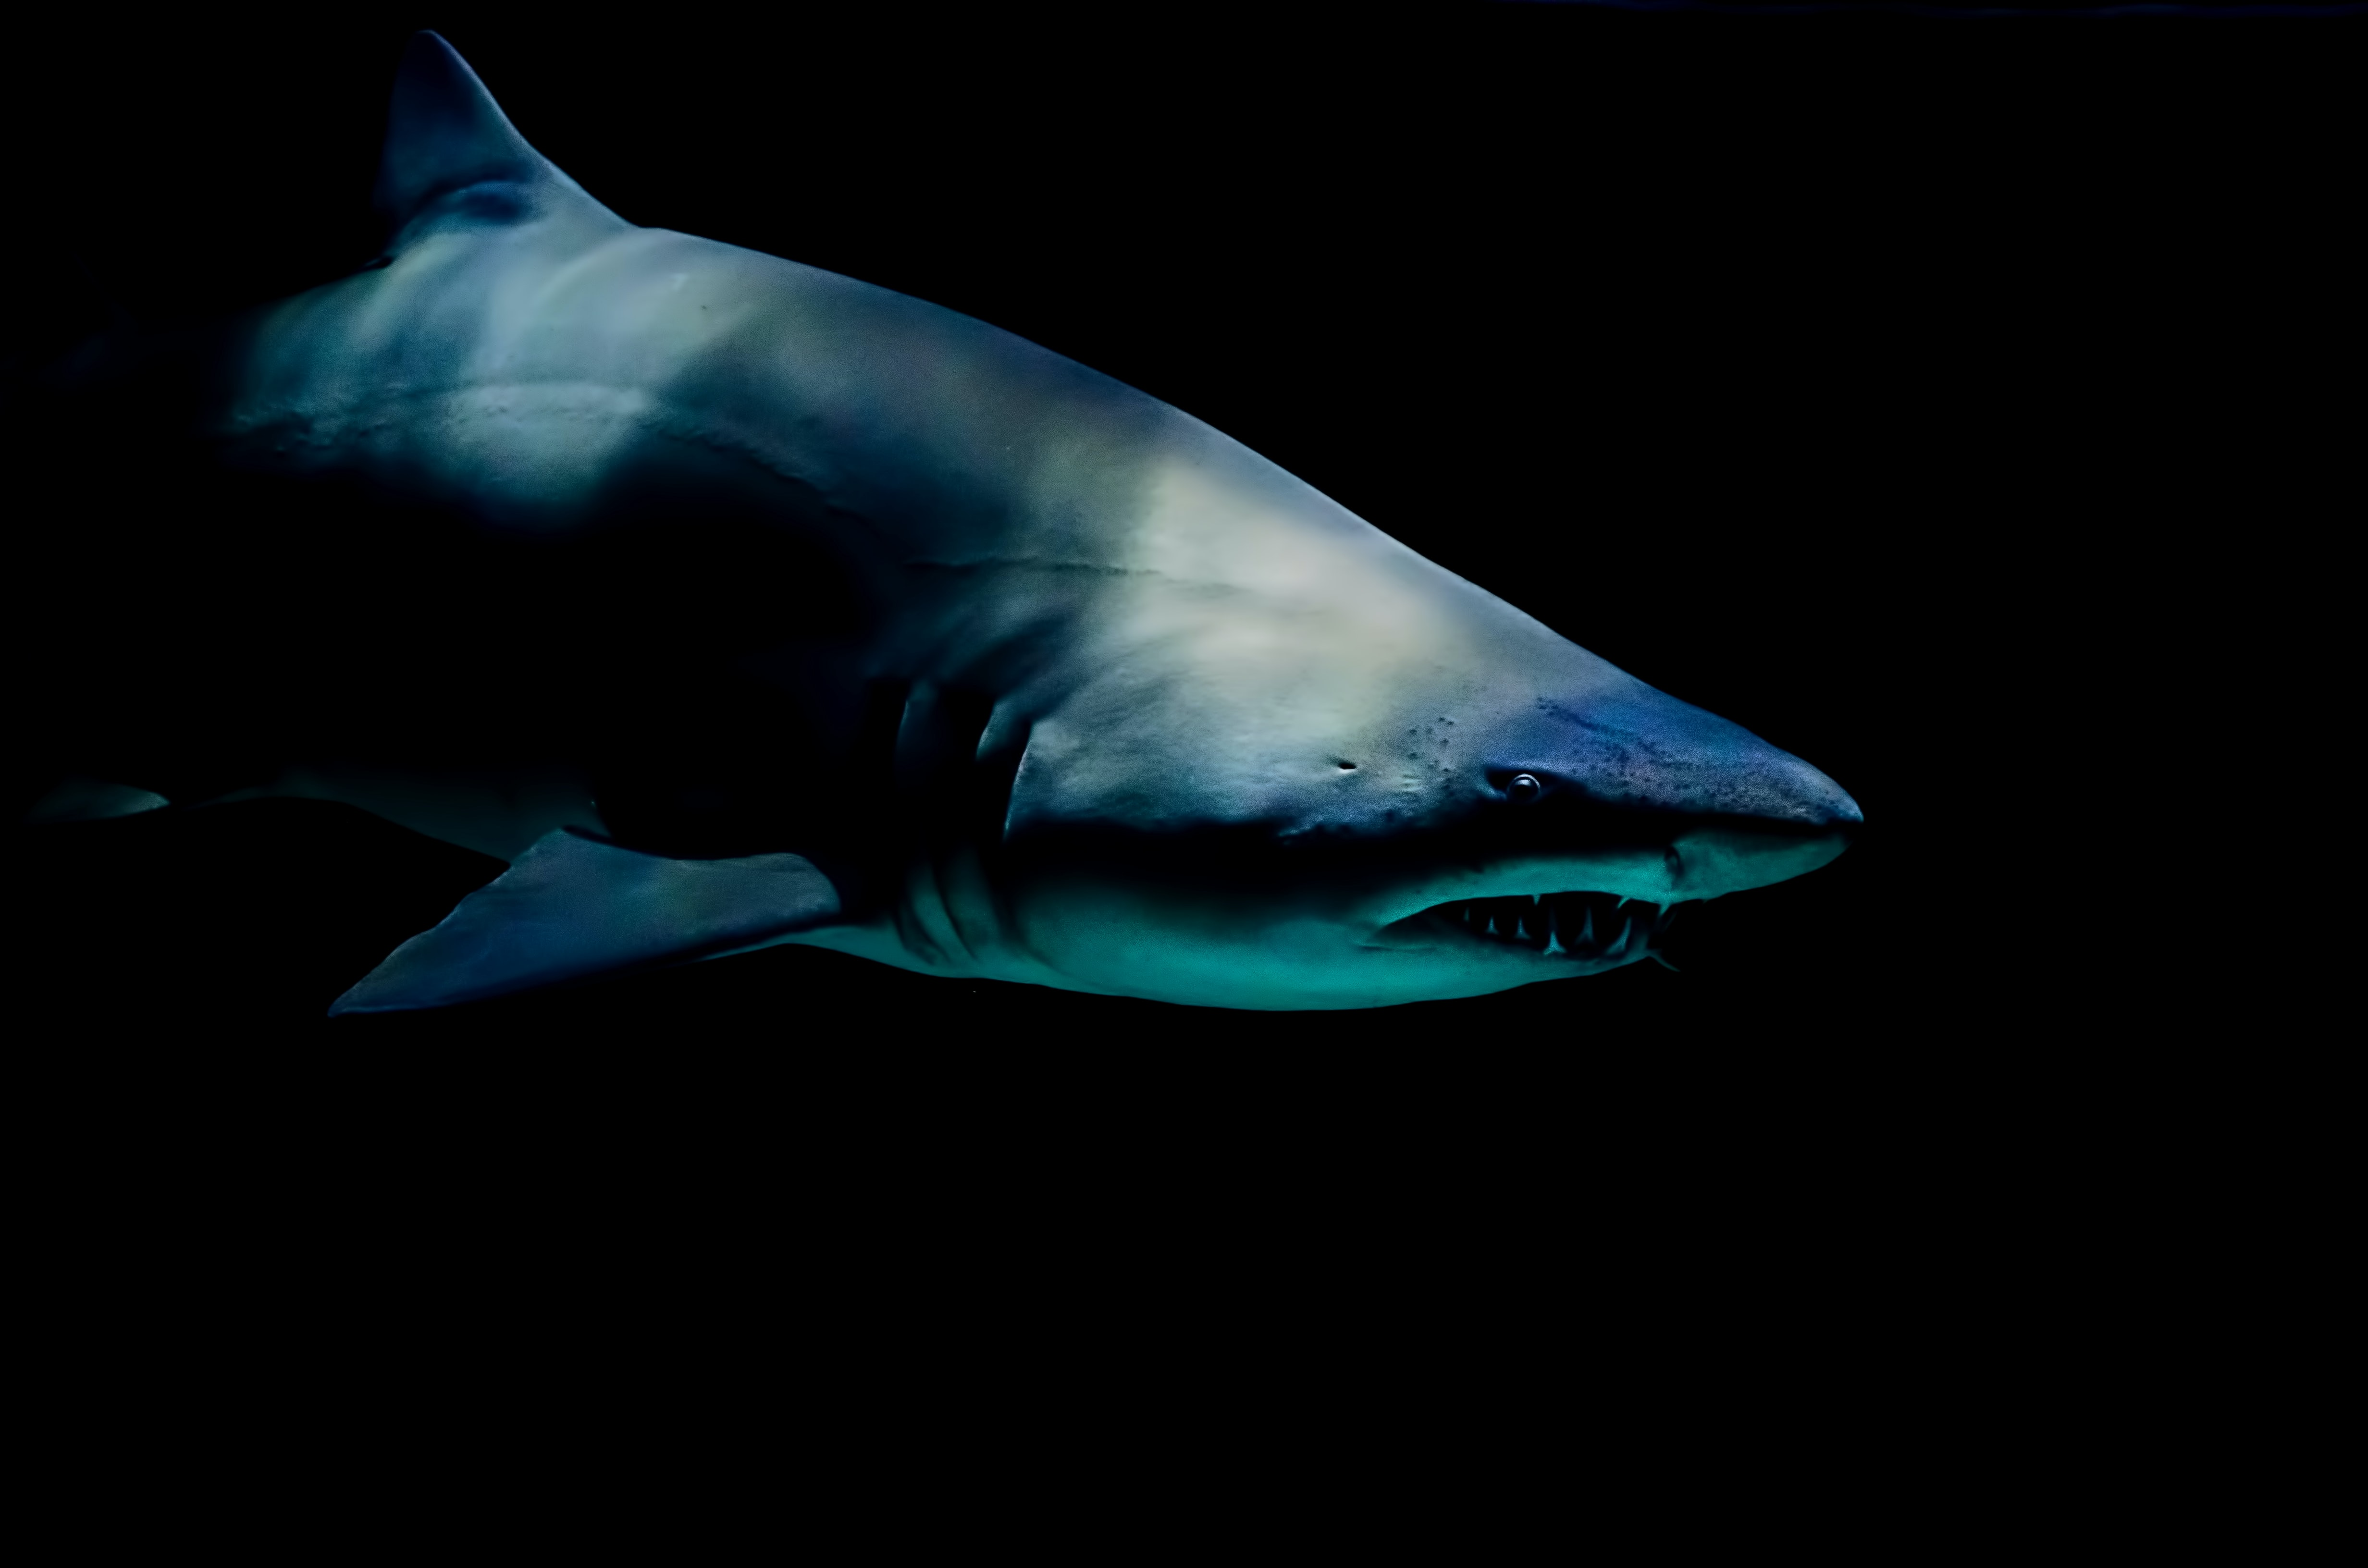 Dark shot of shark with sharp teeth in water at Moody Gardens